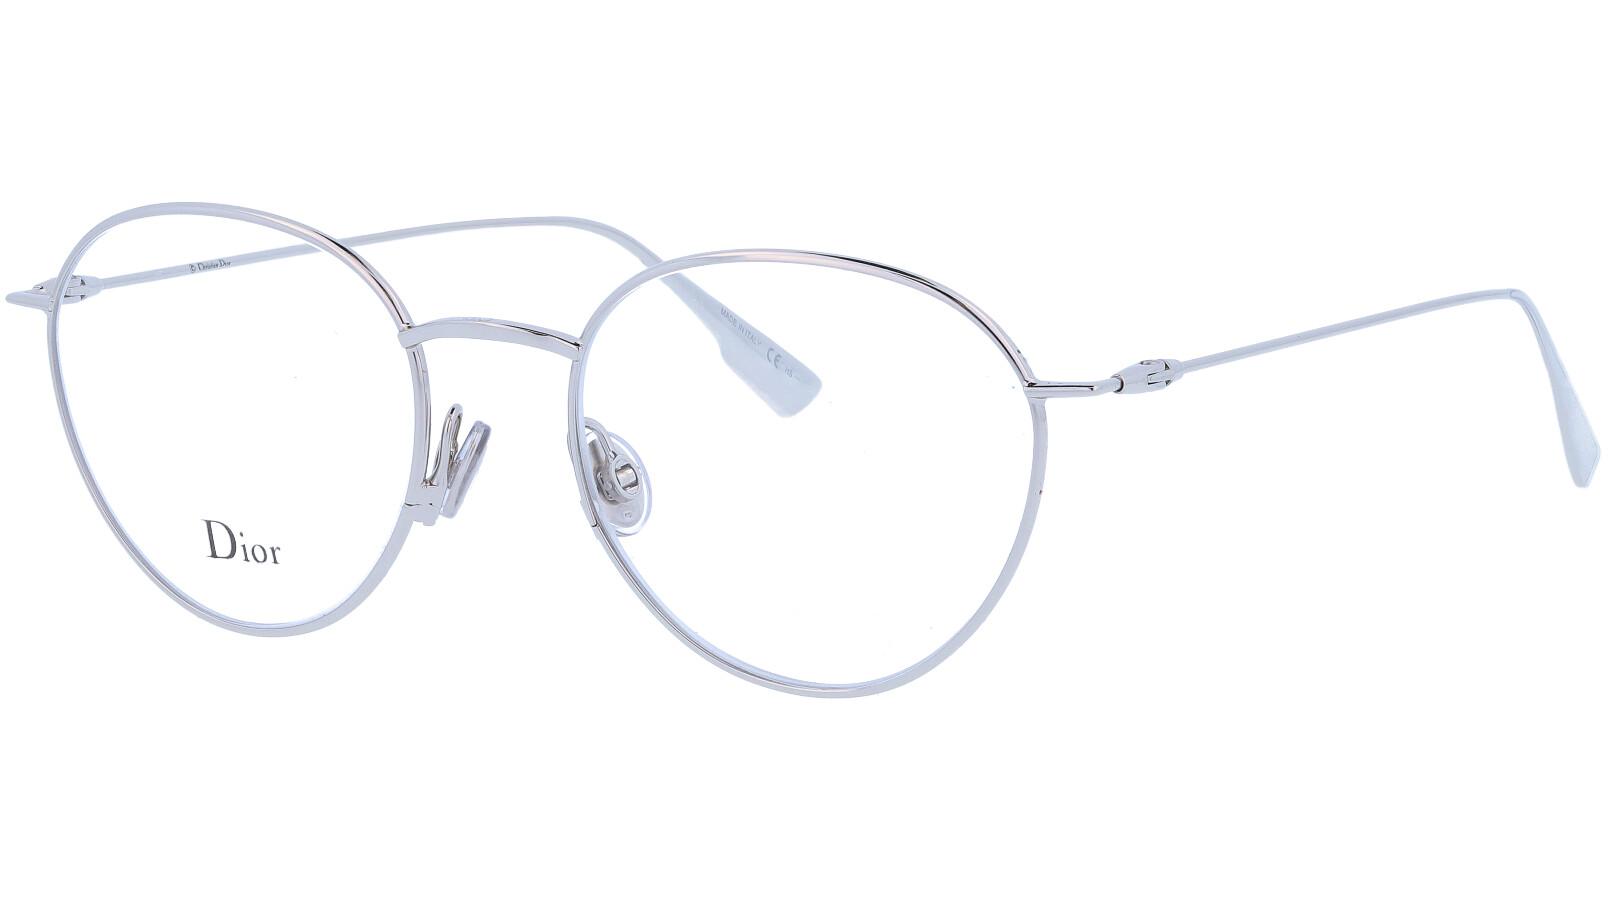 Dior StellaireO2 010 49 Palladium Glasses